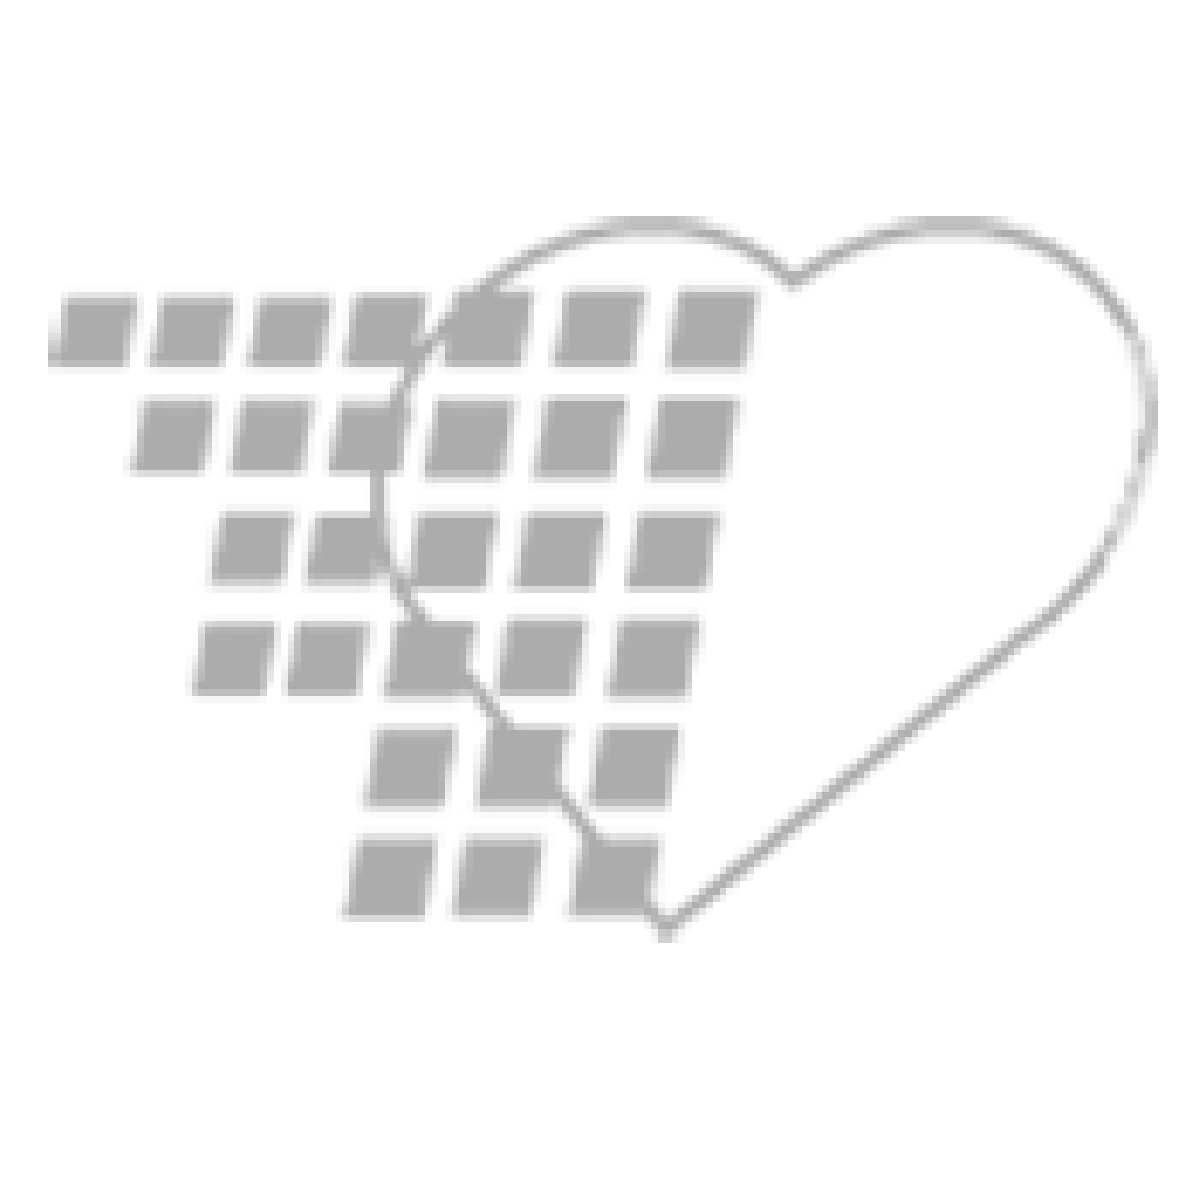 06-93-6011 Demo Dose® TPN Compounding Kit